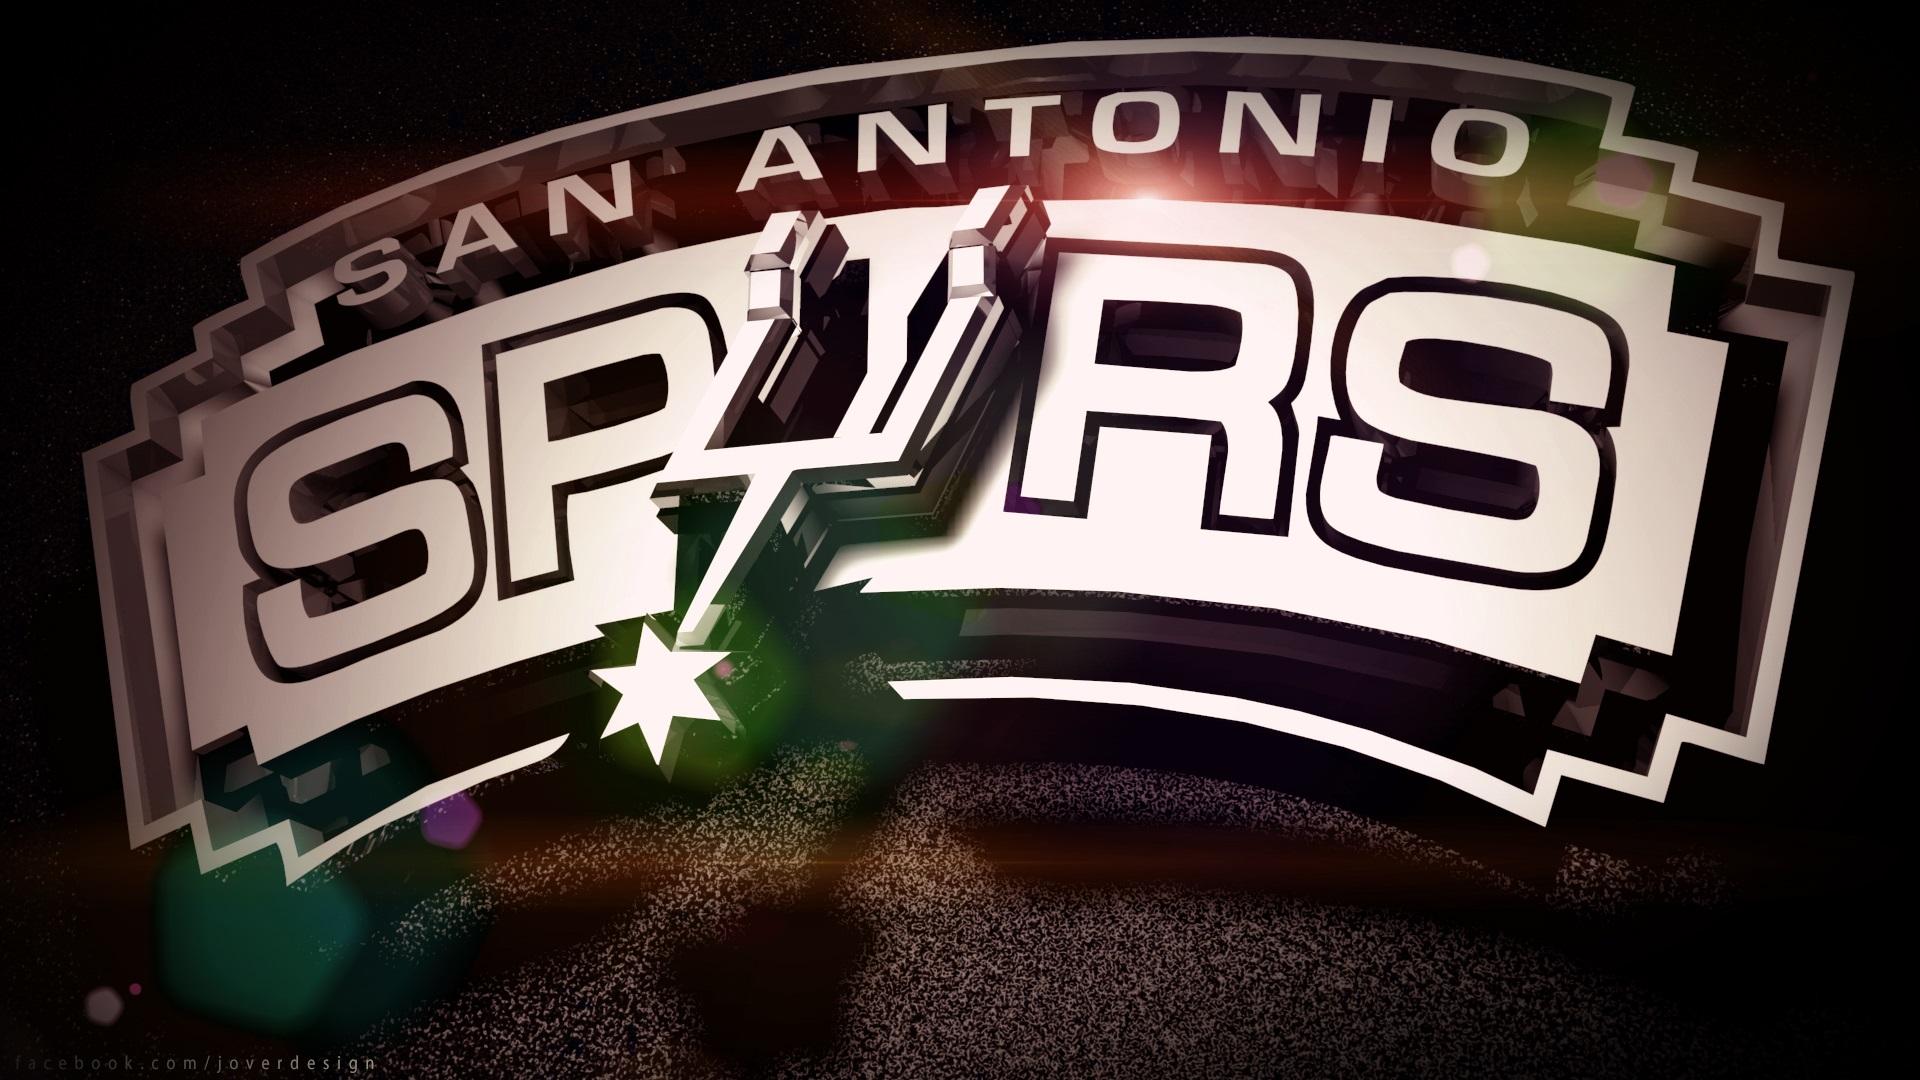 47 San Antonio Spurs Android Wallpaper On Wallpapersafari